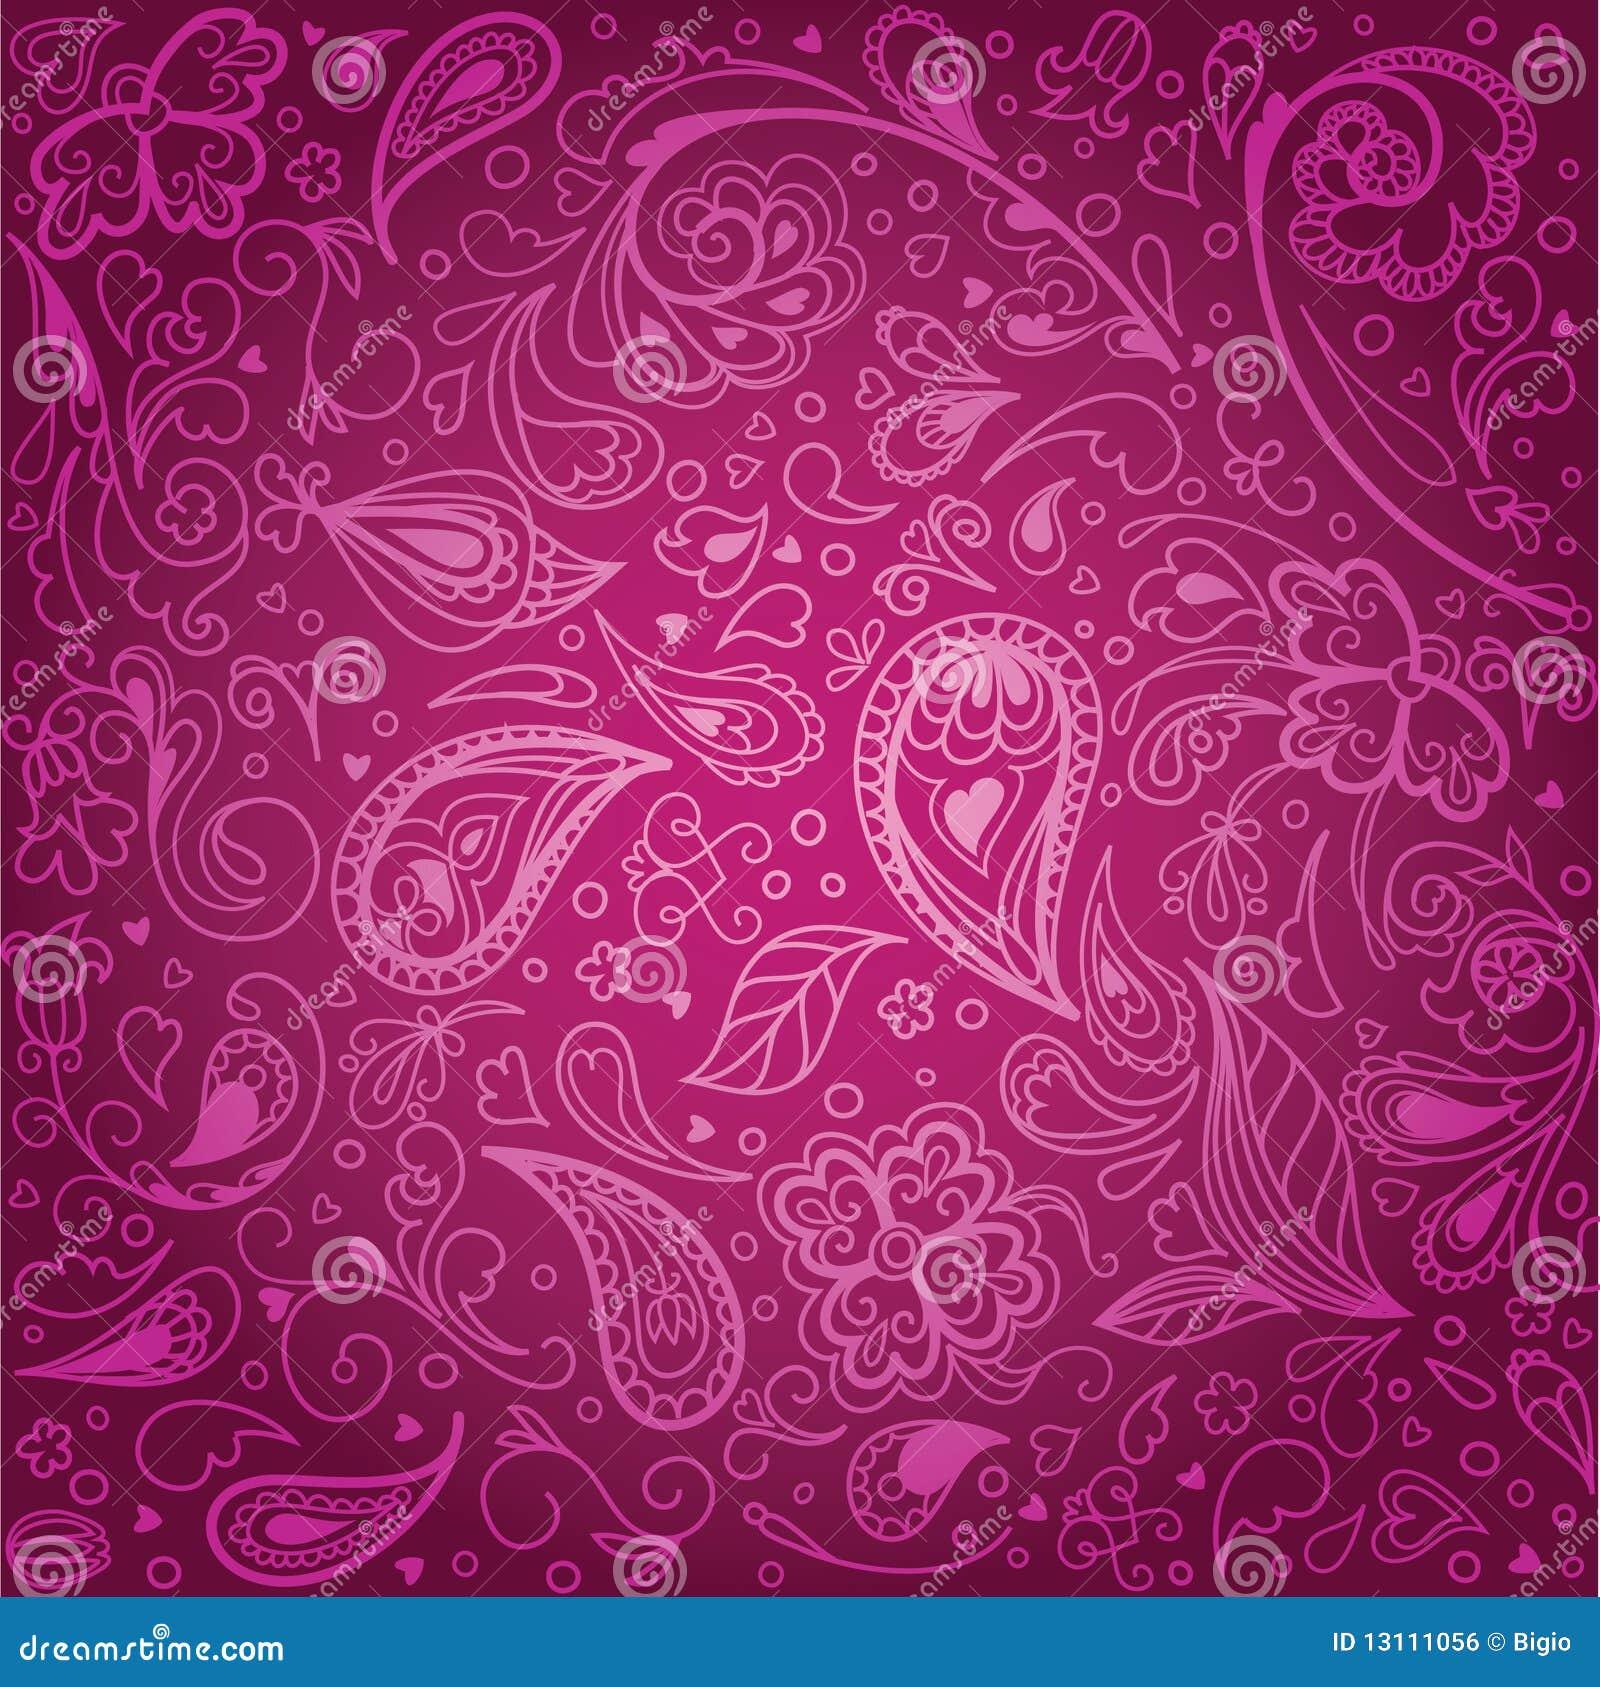 Vintage Floral Background Royalty Free Stock Image - Image: 13111056